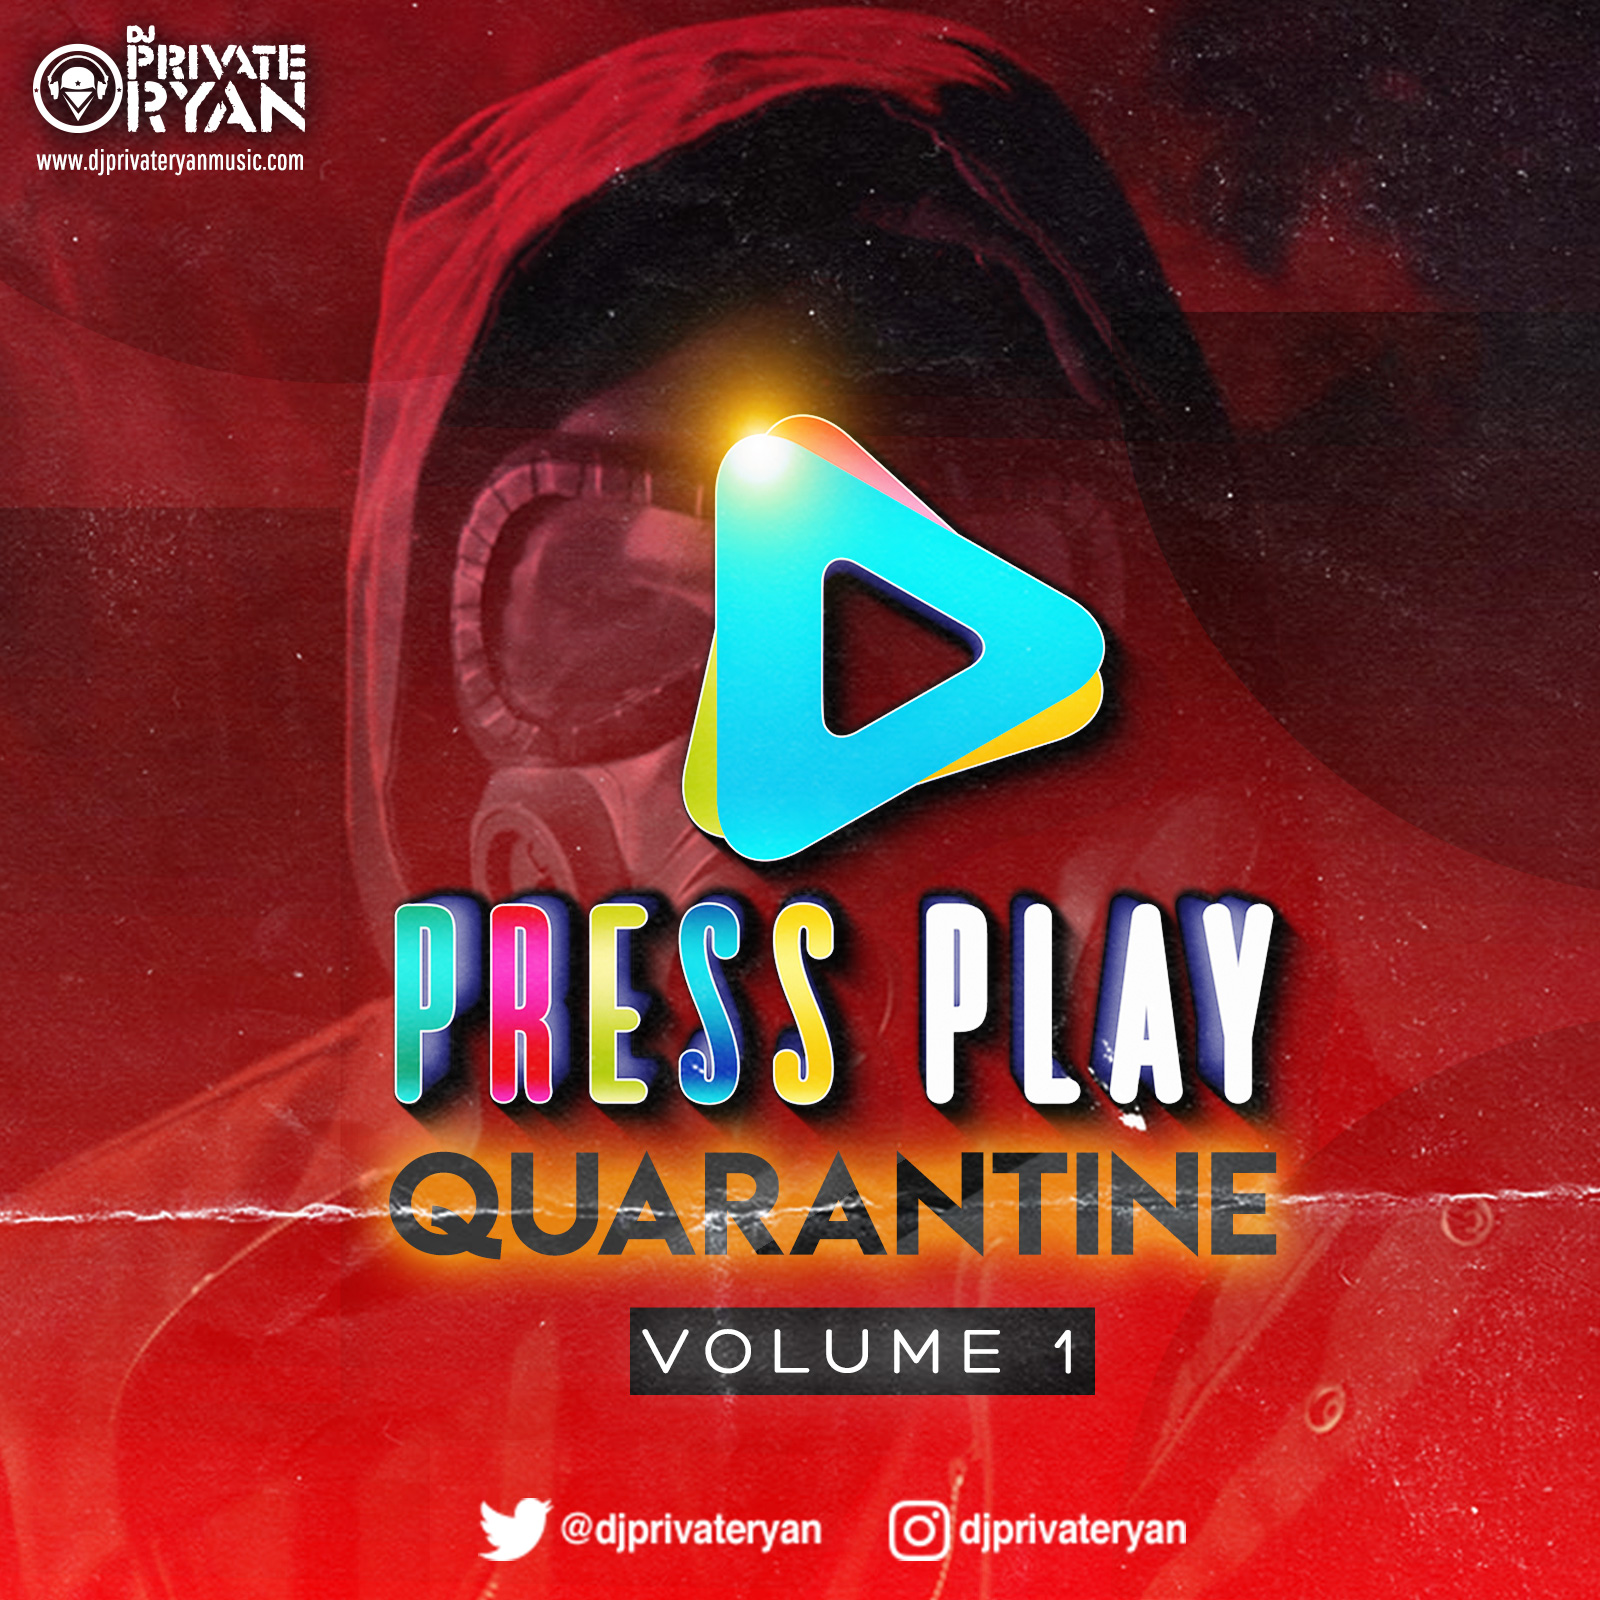 Private Ryan Presents Press Play Quarantine Volume 1